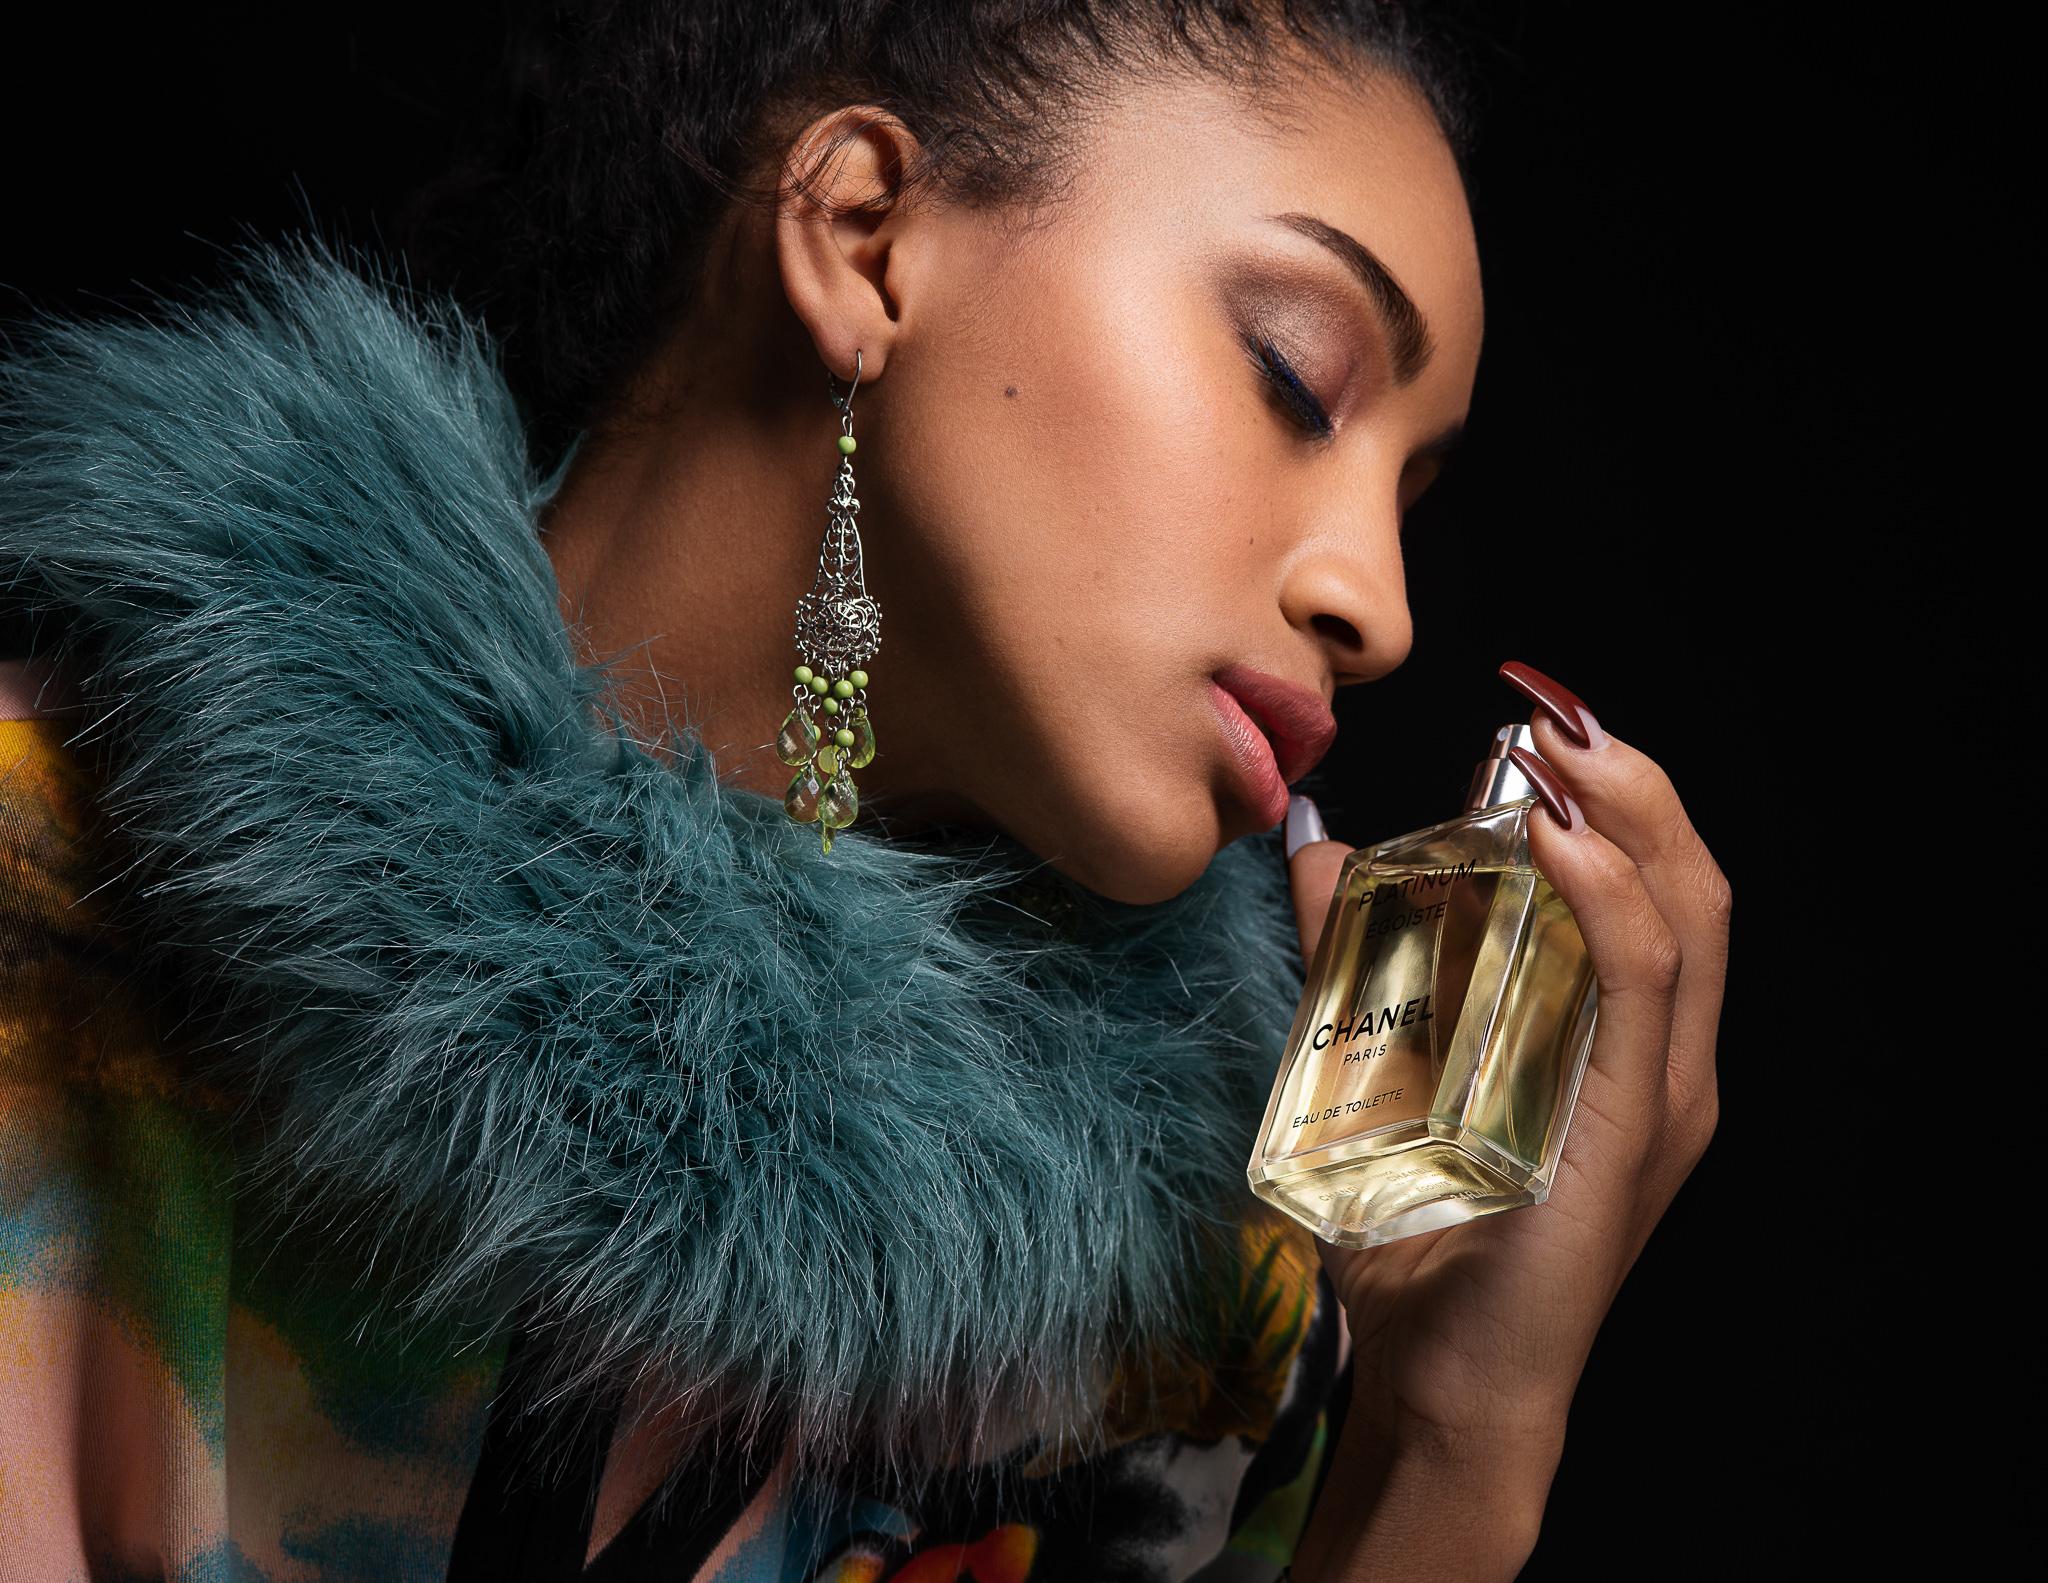 Chicago Beauty Photographer Patrick Simmons-16.jpg